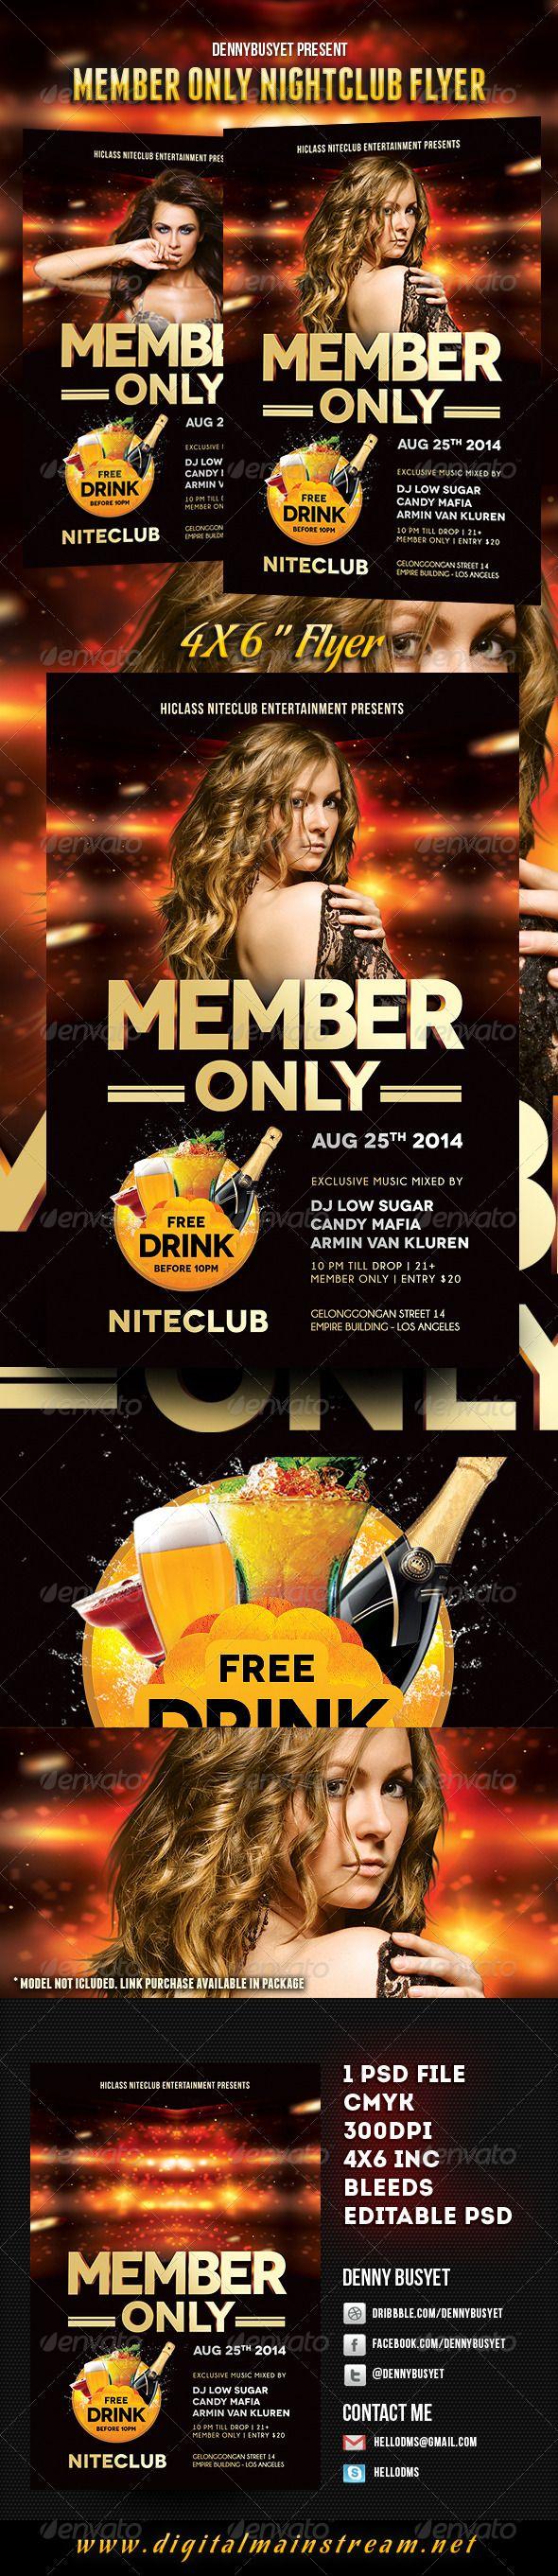 Member Only Nightclub Flyer Template Nightclub Party Night Dance